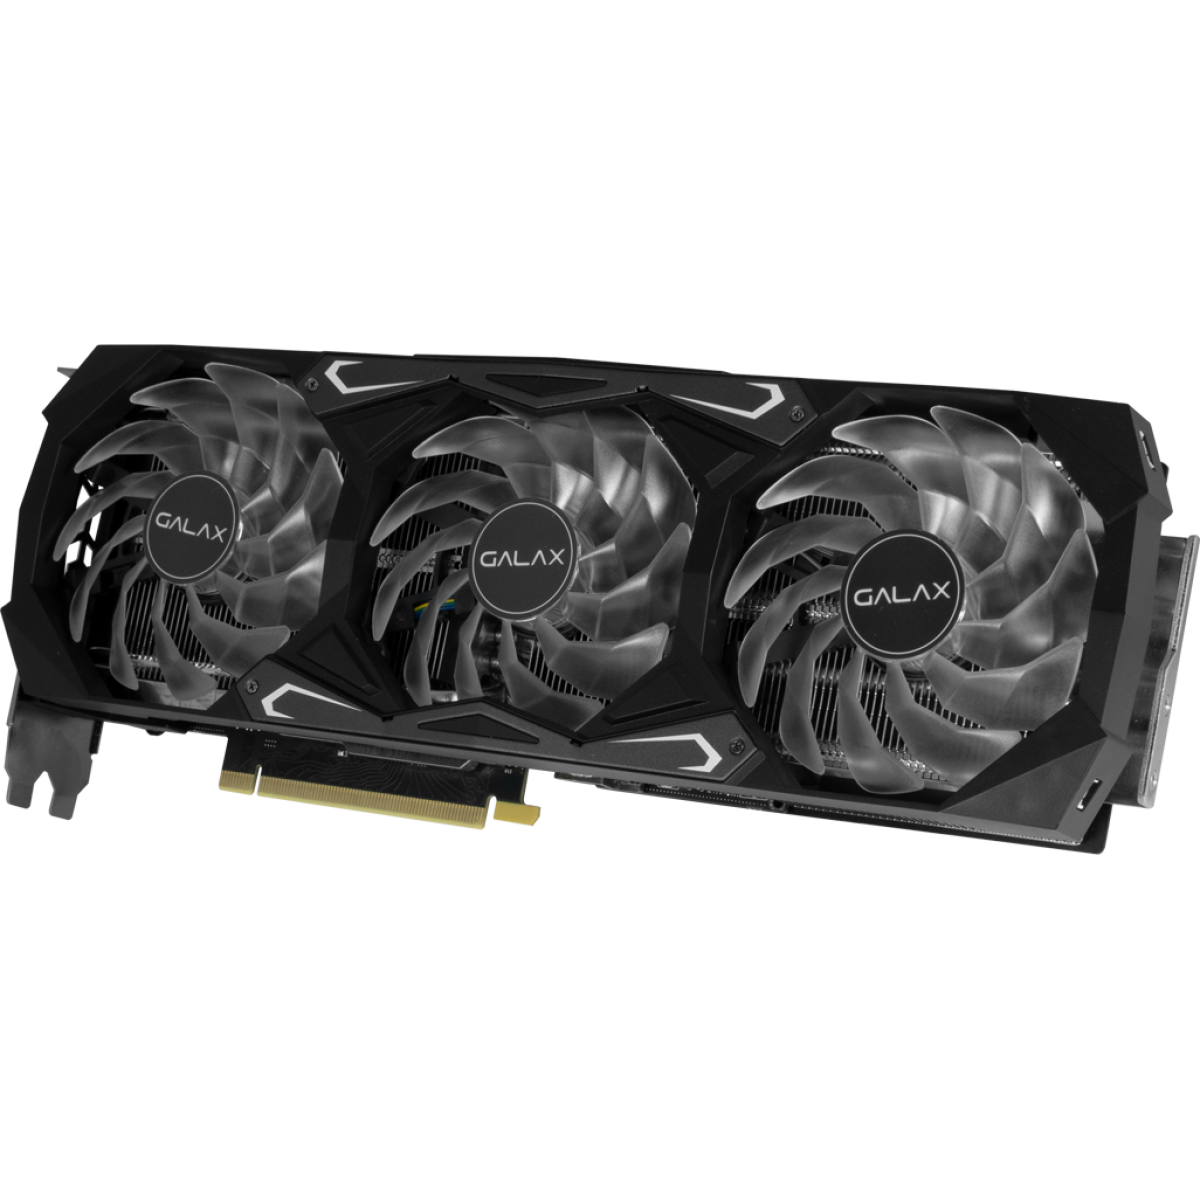 Placa de Vídeo Galax, GeForce RTX 3090 SG, 1 Click OC, 24GB, GDDR6X, 384Bit, 39NSM5MD1GNA